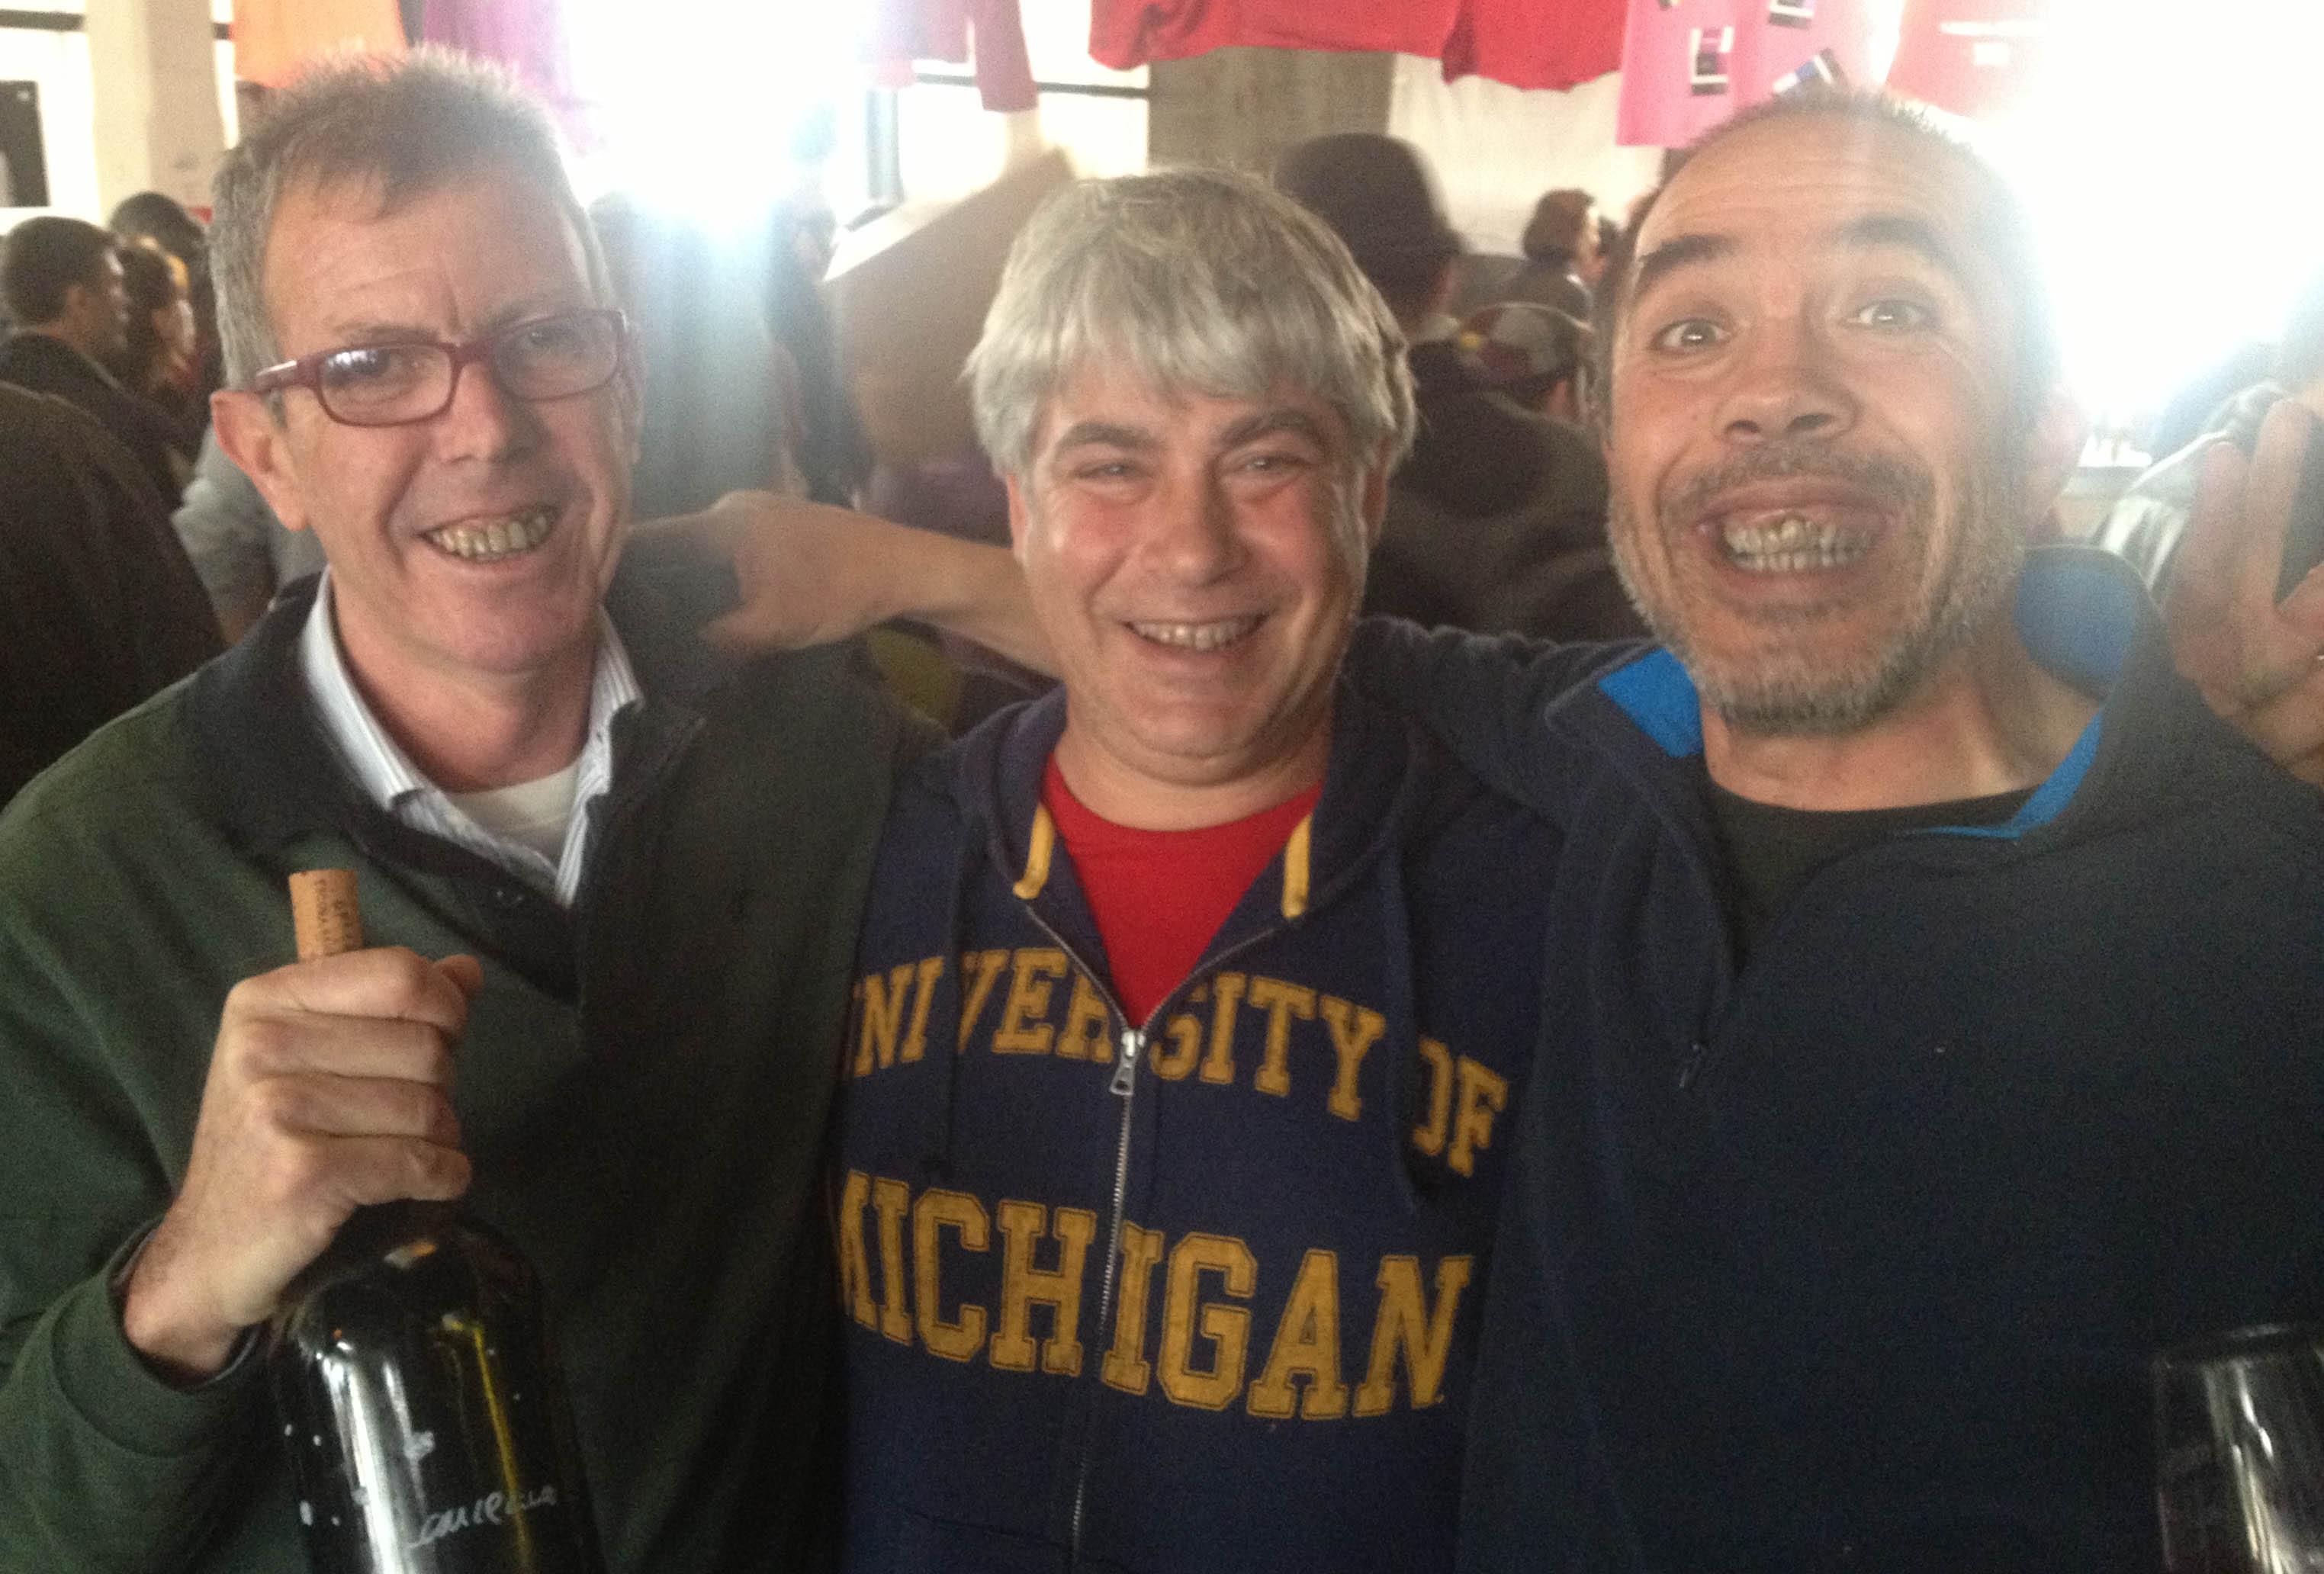 Antonio Vilchez, Jordi Llorens, Laureano Serres, les Tres Luces du vin nature espagnol